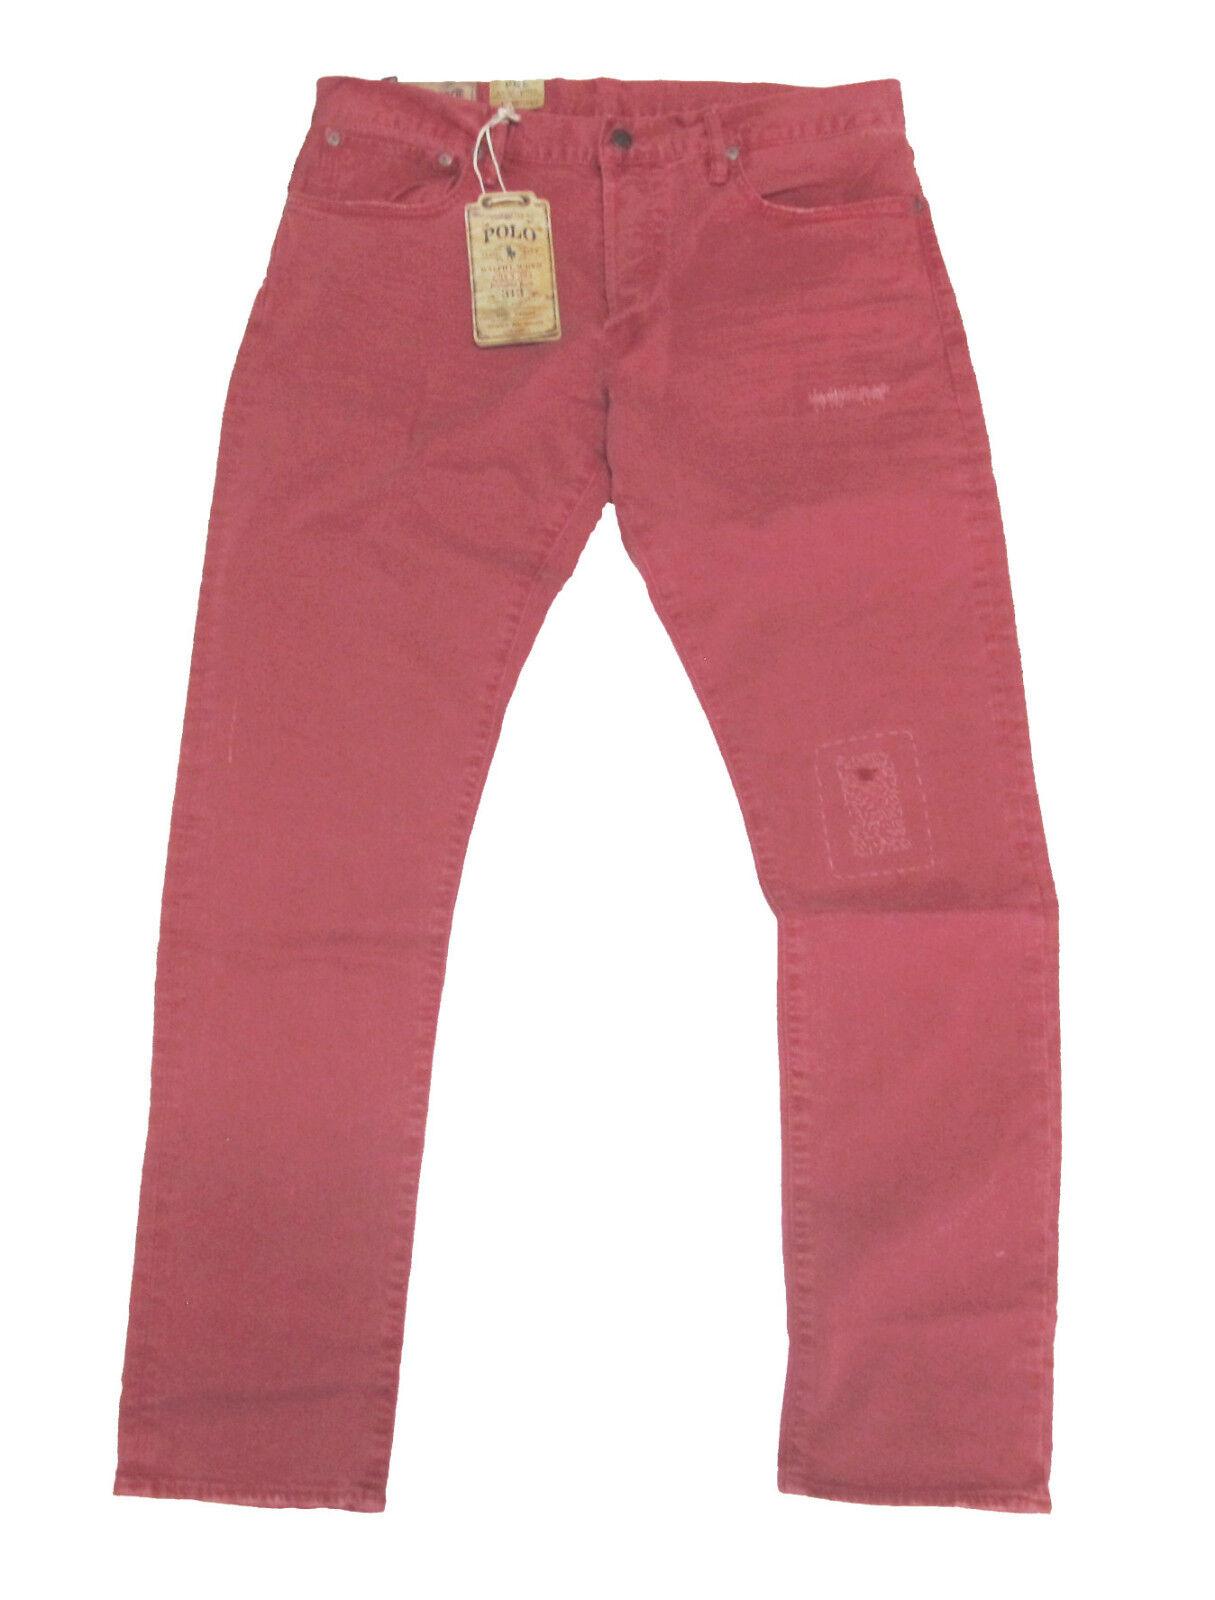 Polo Ralph Lauren Mens Sullivan Slim Low Rise Red Distressed Denim Jeans Pants